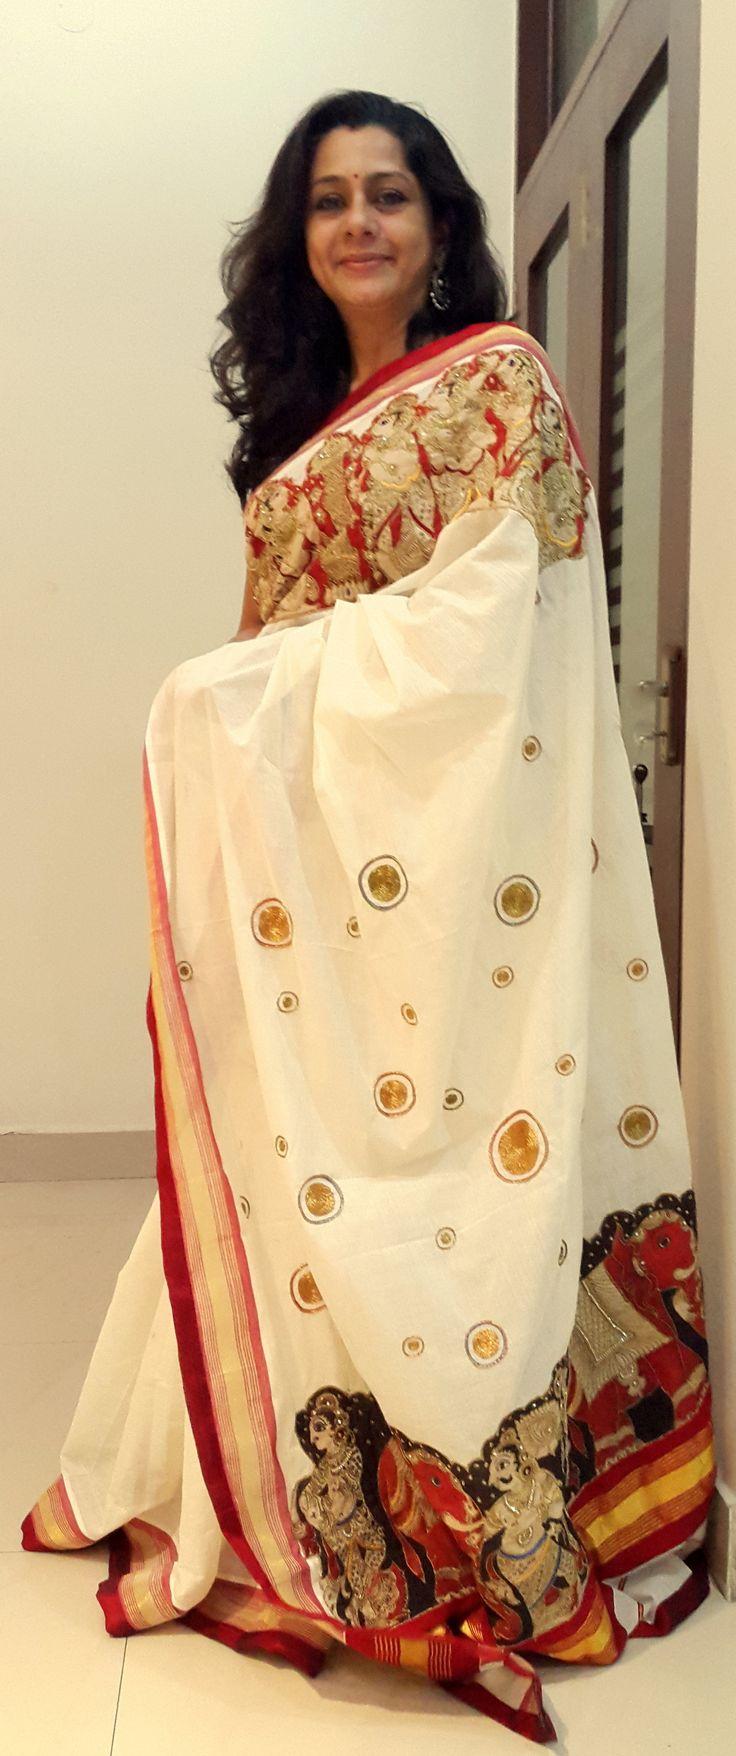 Pen Kalamkari on Kerala Saree  Paarvati Kiriyath Bharath  Hastakala Kalamkari Winter Collection 2015